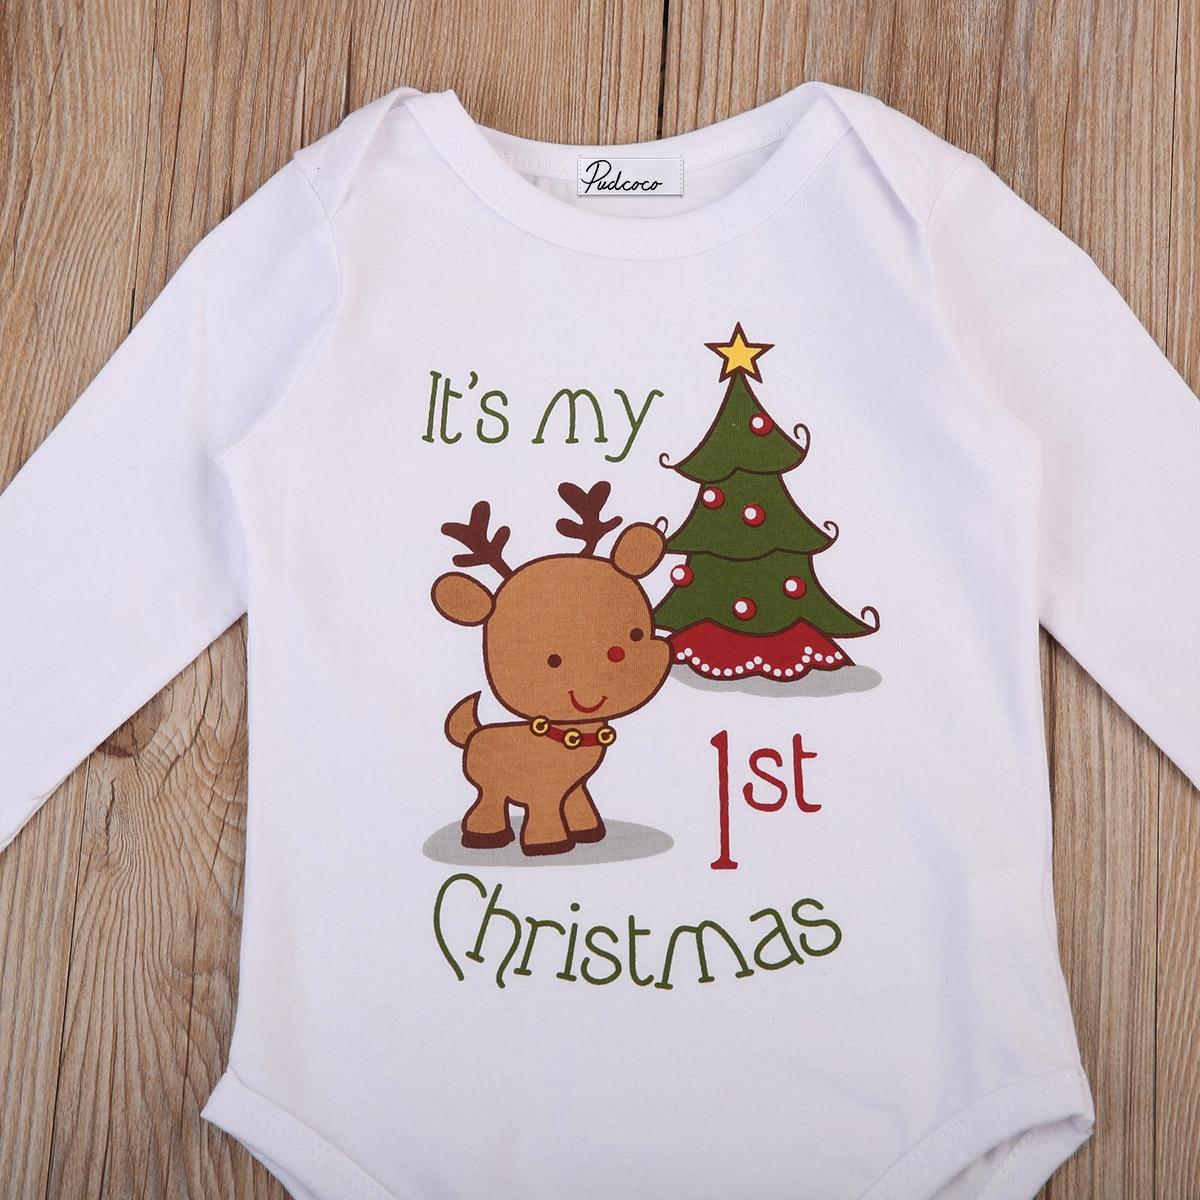 HTB1CUXpXRUSMeJjy1zdq6yR3FXa8 christmas baby romper newborn infant baby boys girls cartoon deer Christmas tree print long sleeves romper autumn baby clothing